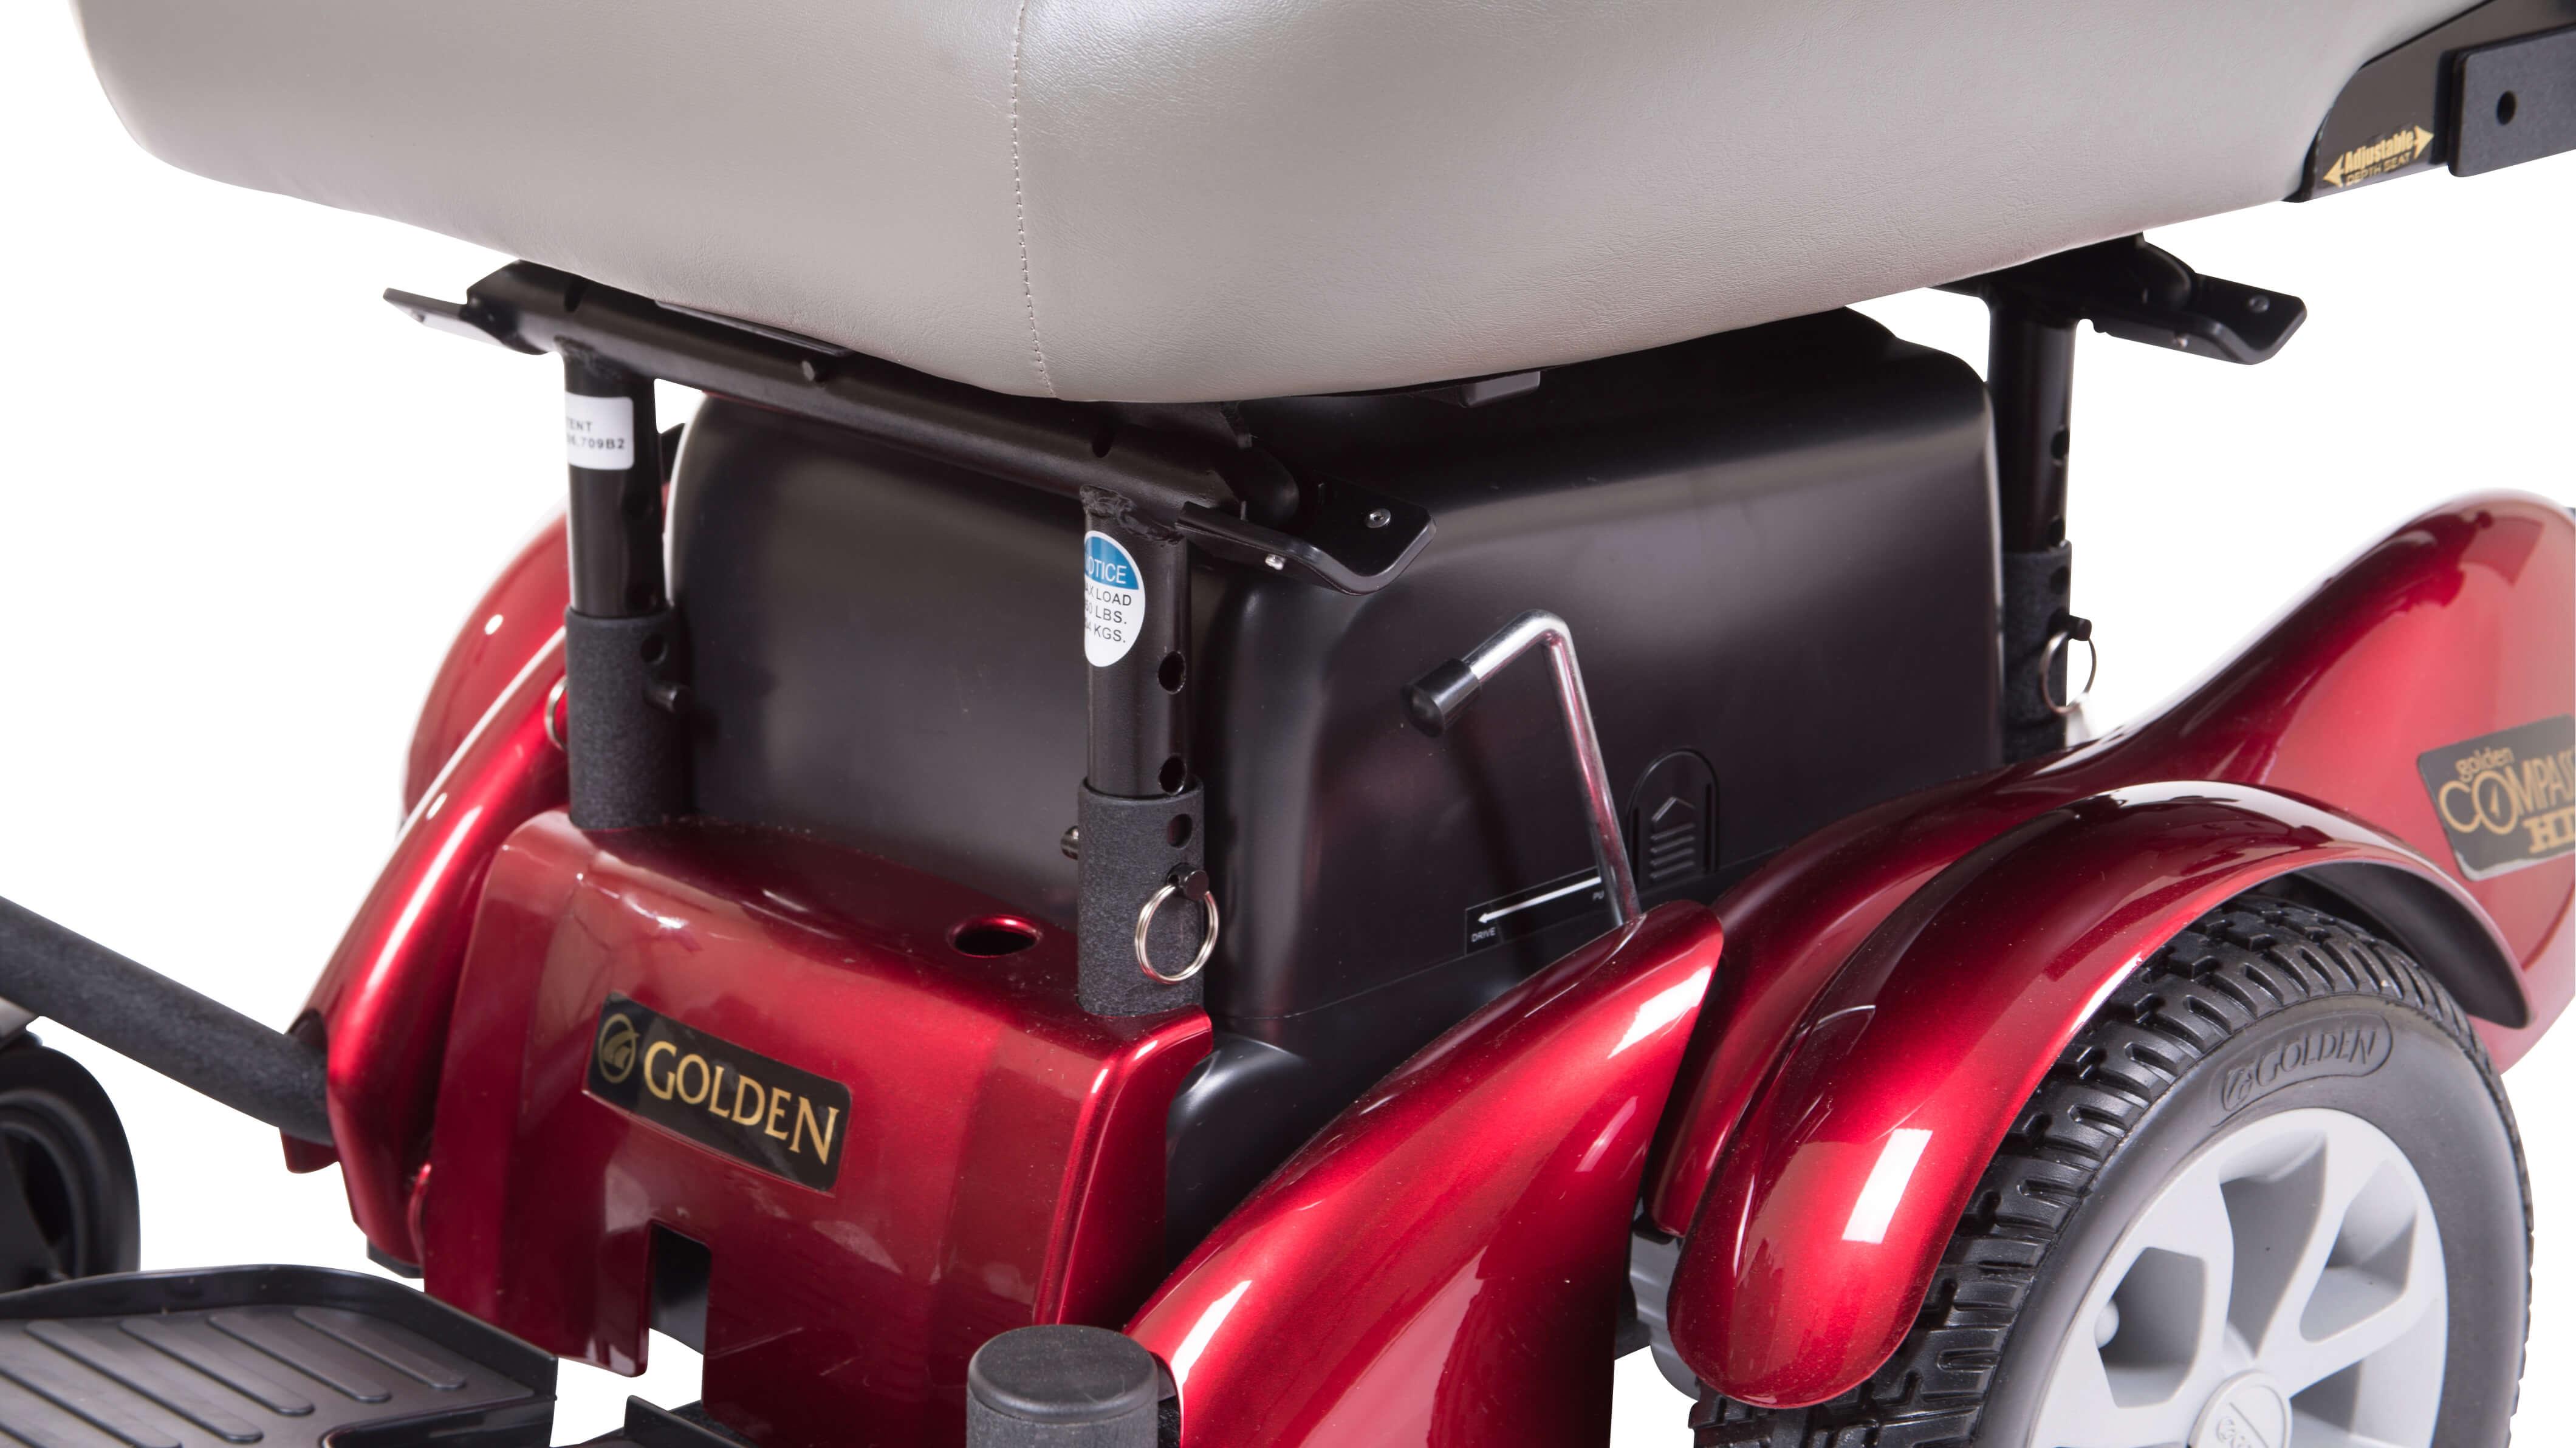 golden power chair repairing cane seat chairs technologies gp620 compass hd heavy duty